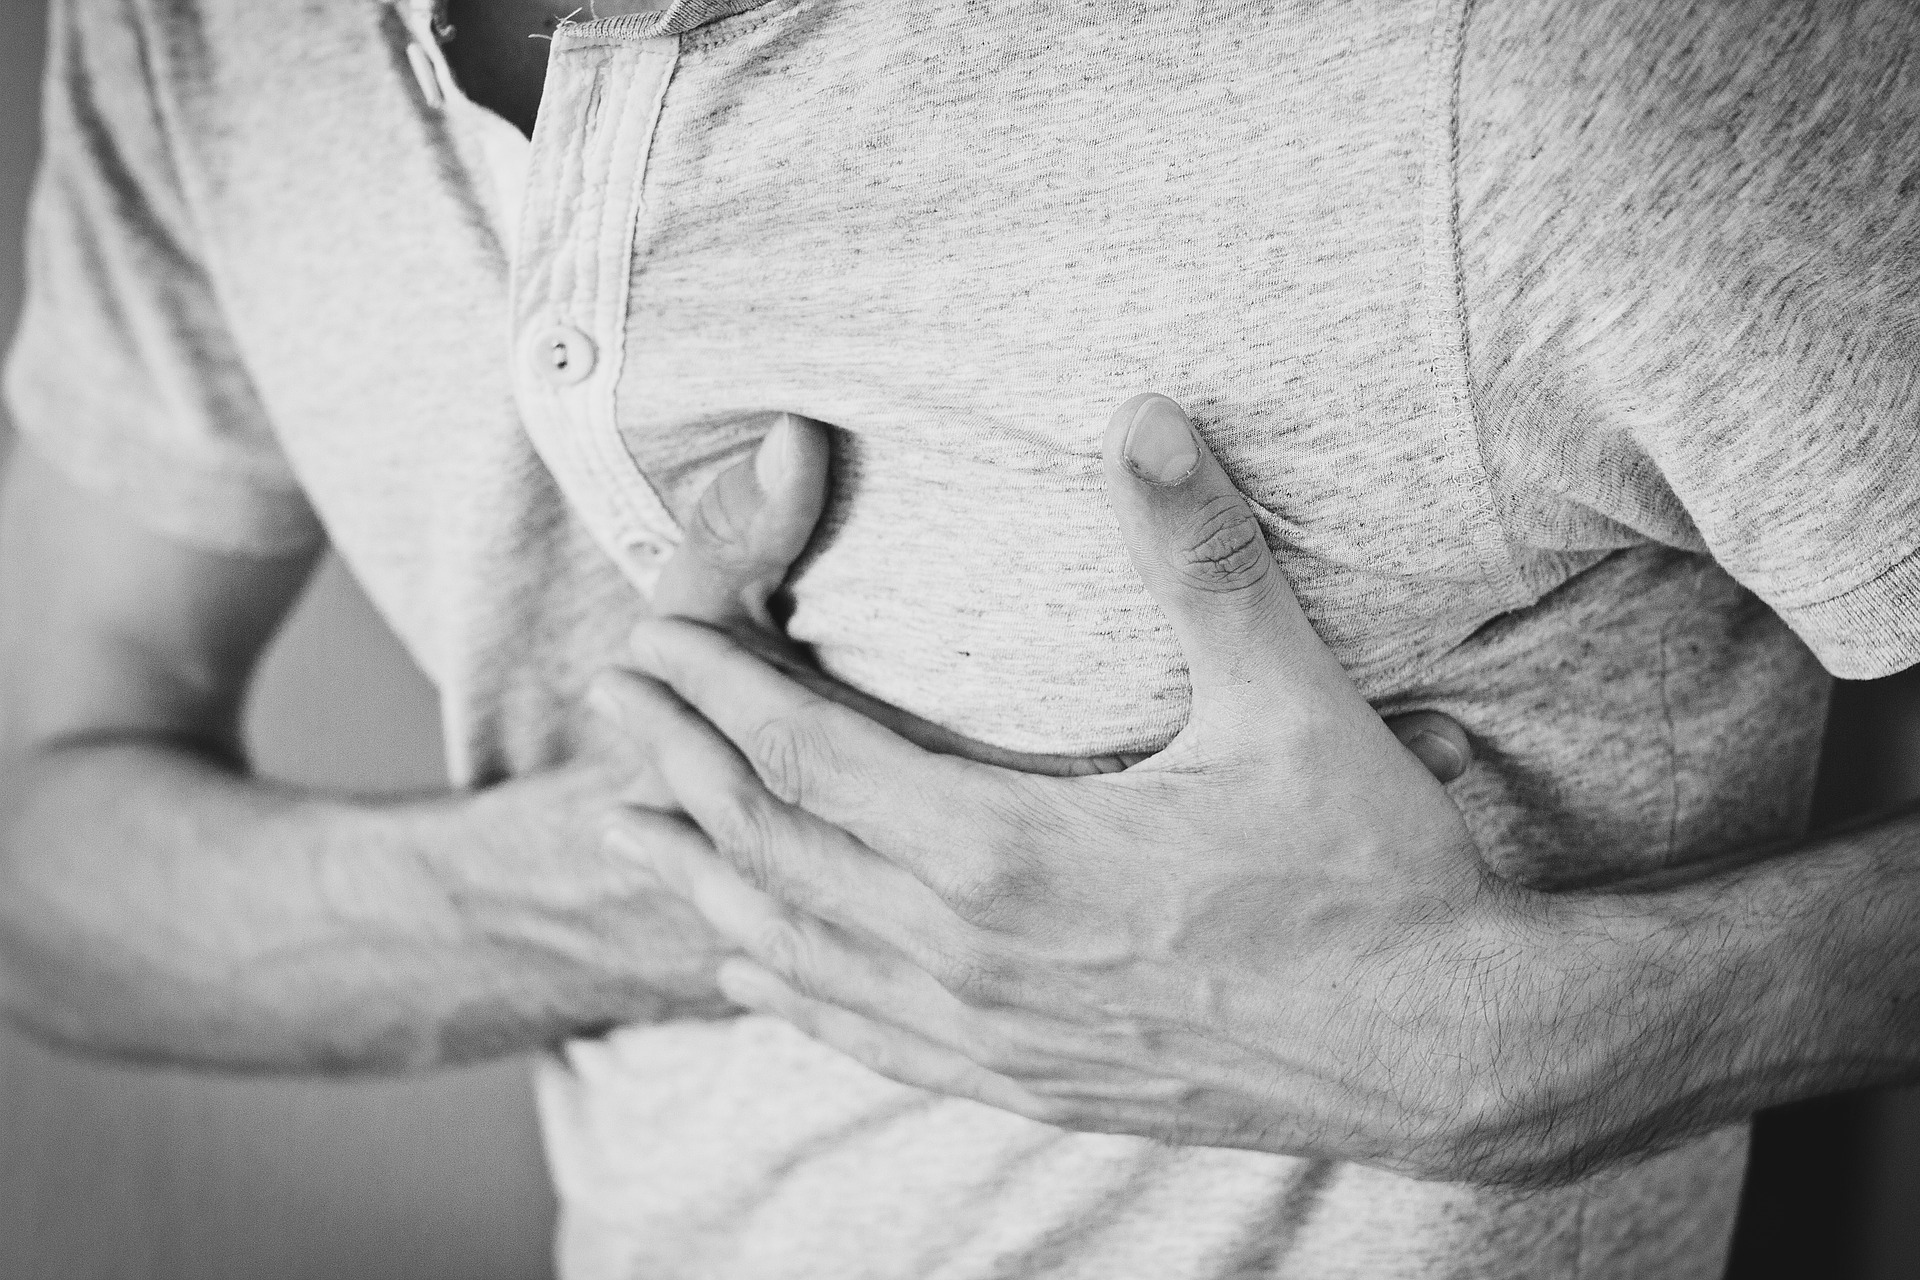 heartache-1846050_1920.jpg